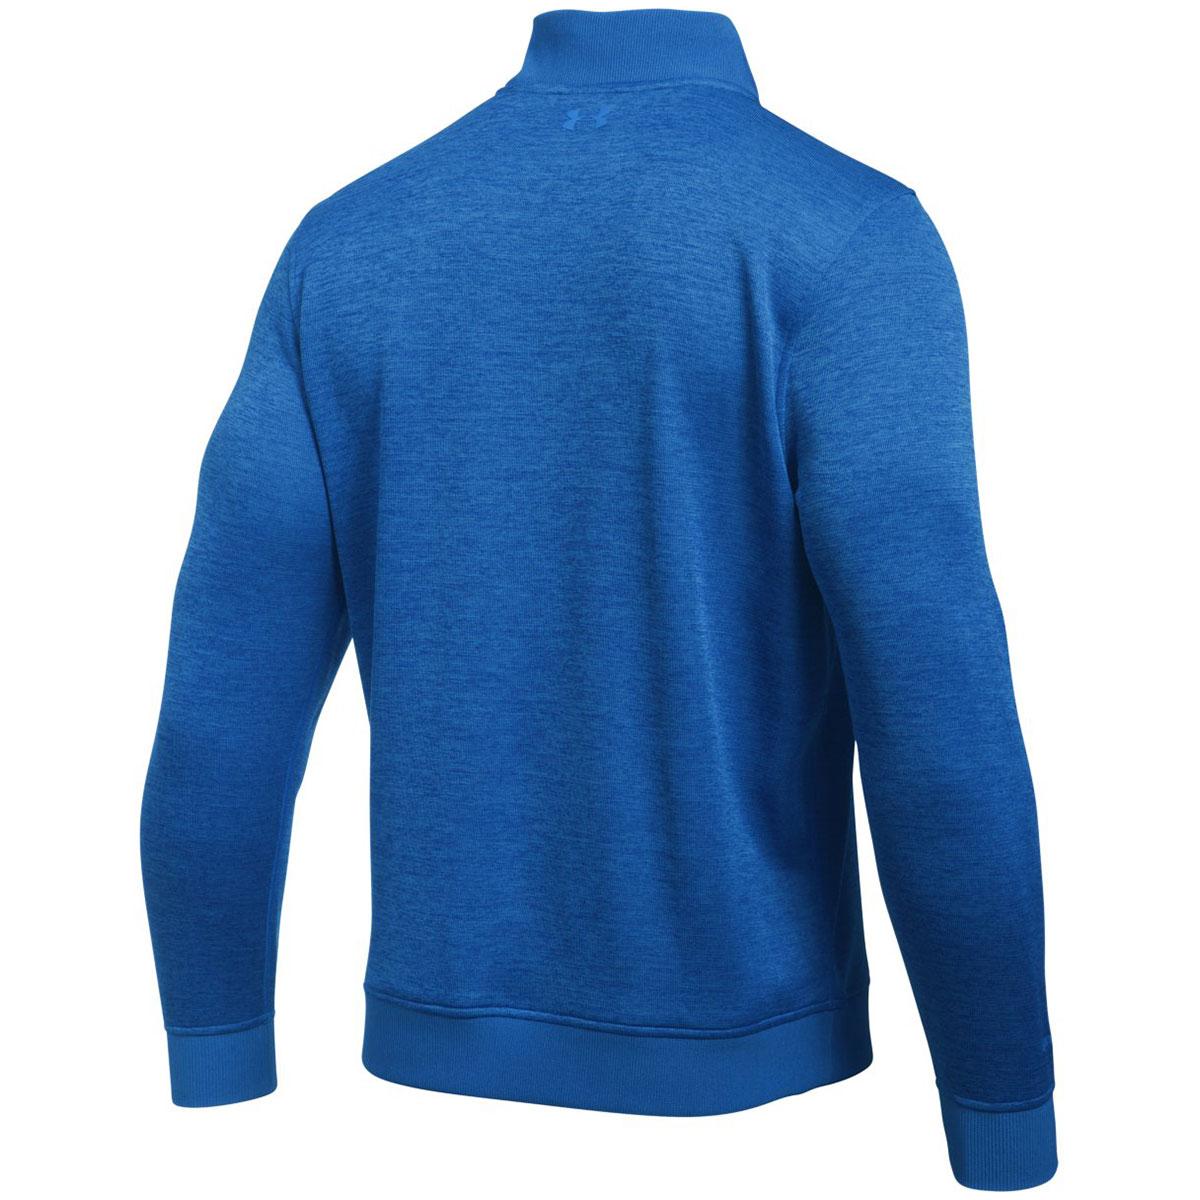 Under-Armour-Mens-UA-Storm-Sweater-Fleece-1-4-Zip-Pullover-Jumper-25-OFF-RRP thumbnail 12